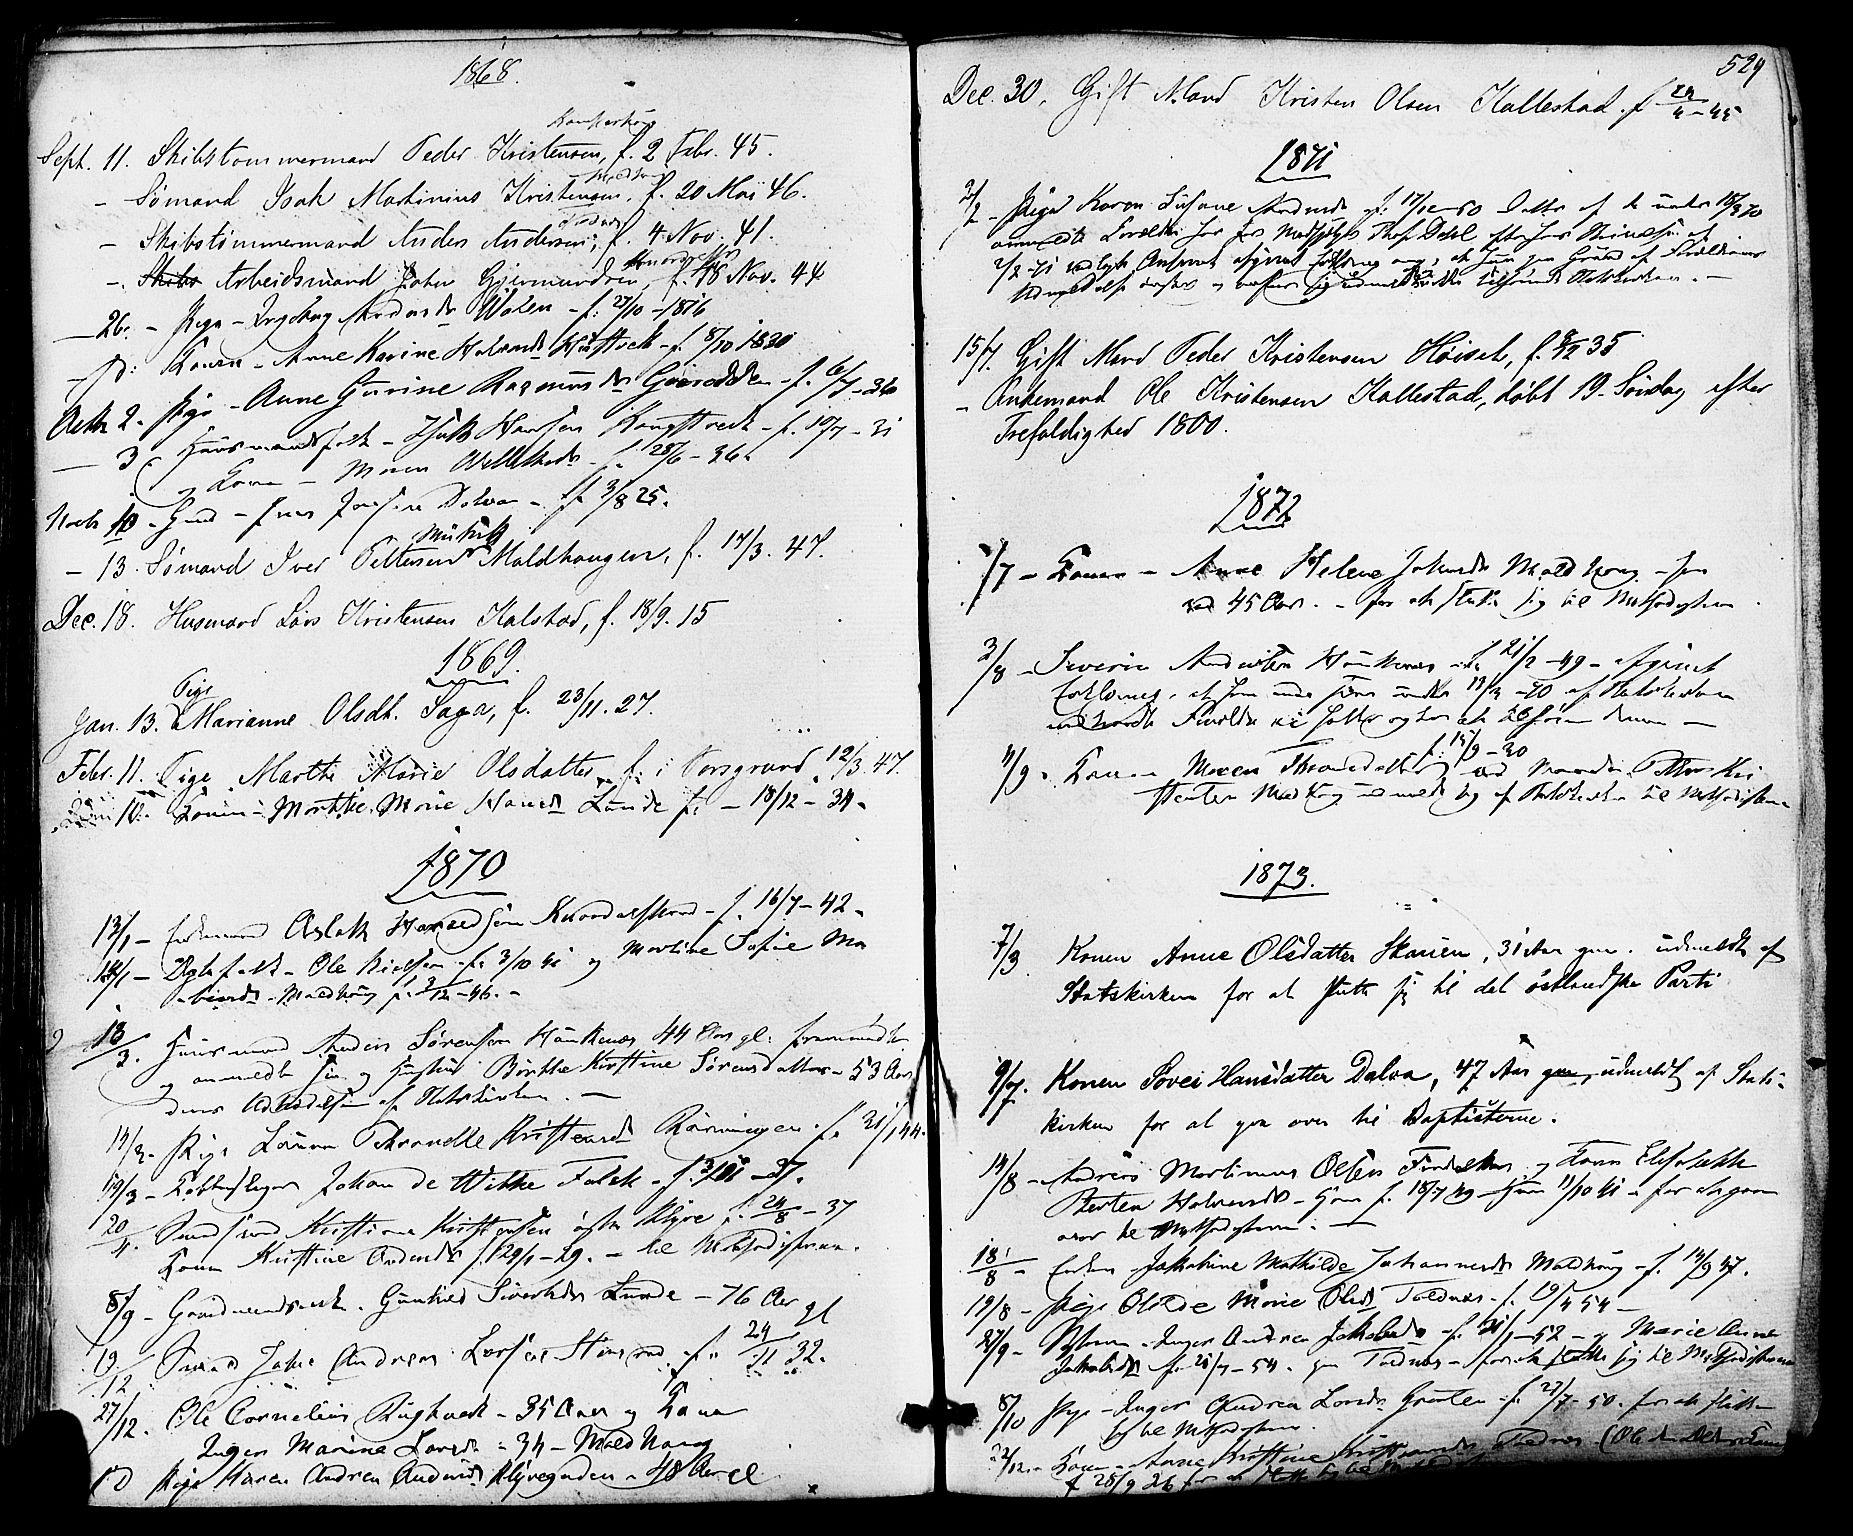 SAKO, Solum kirkebøker, F/Fa/L0008: Ministerialbok nr. I 8, 1865-1876, s. 529